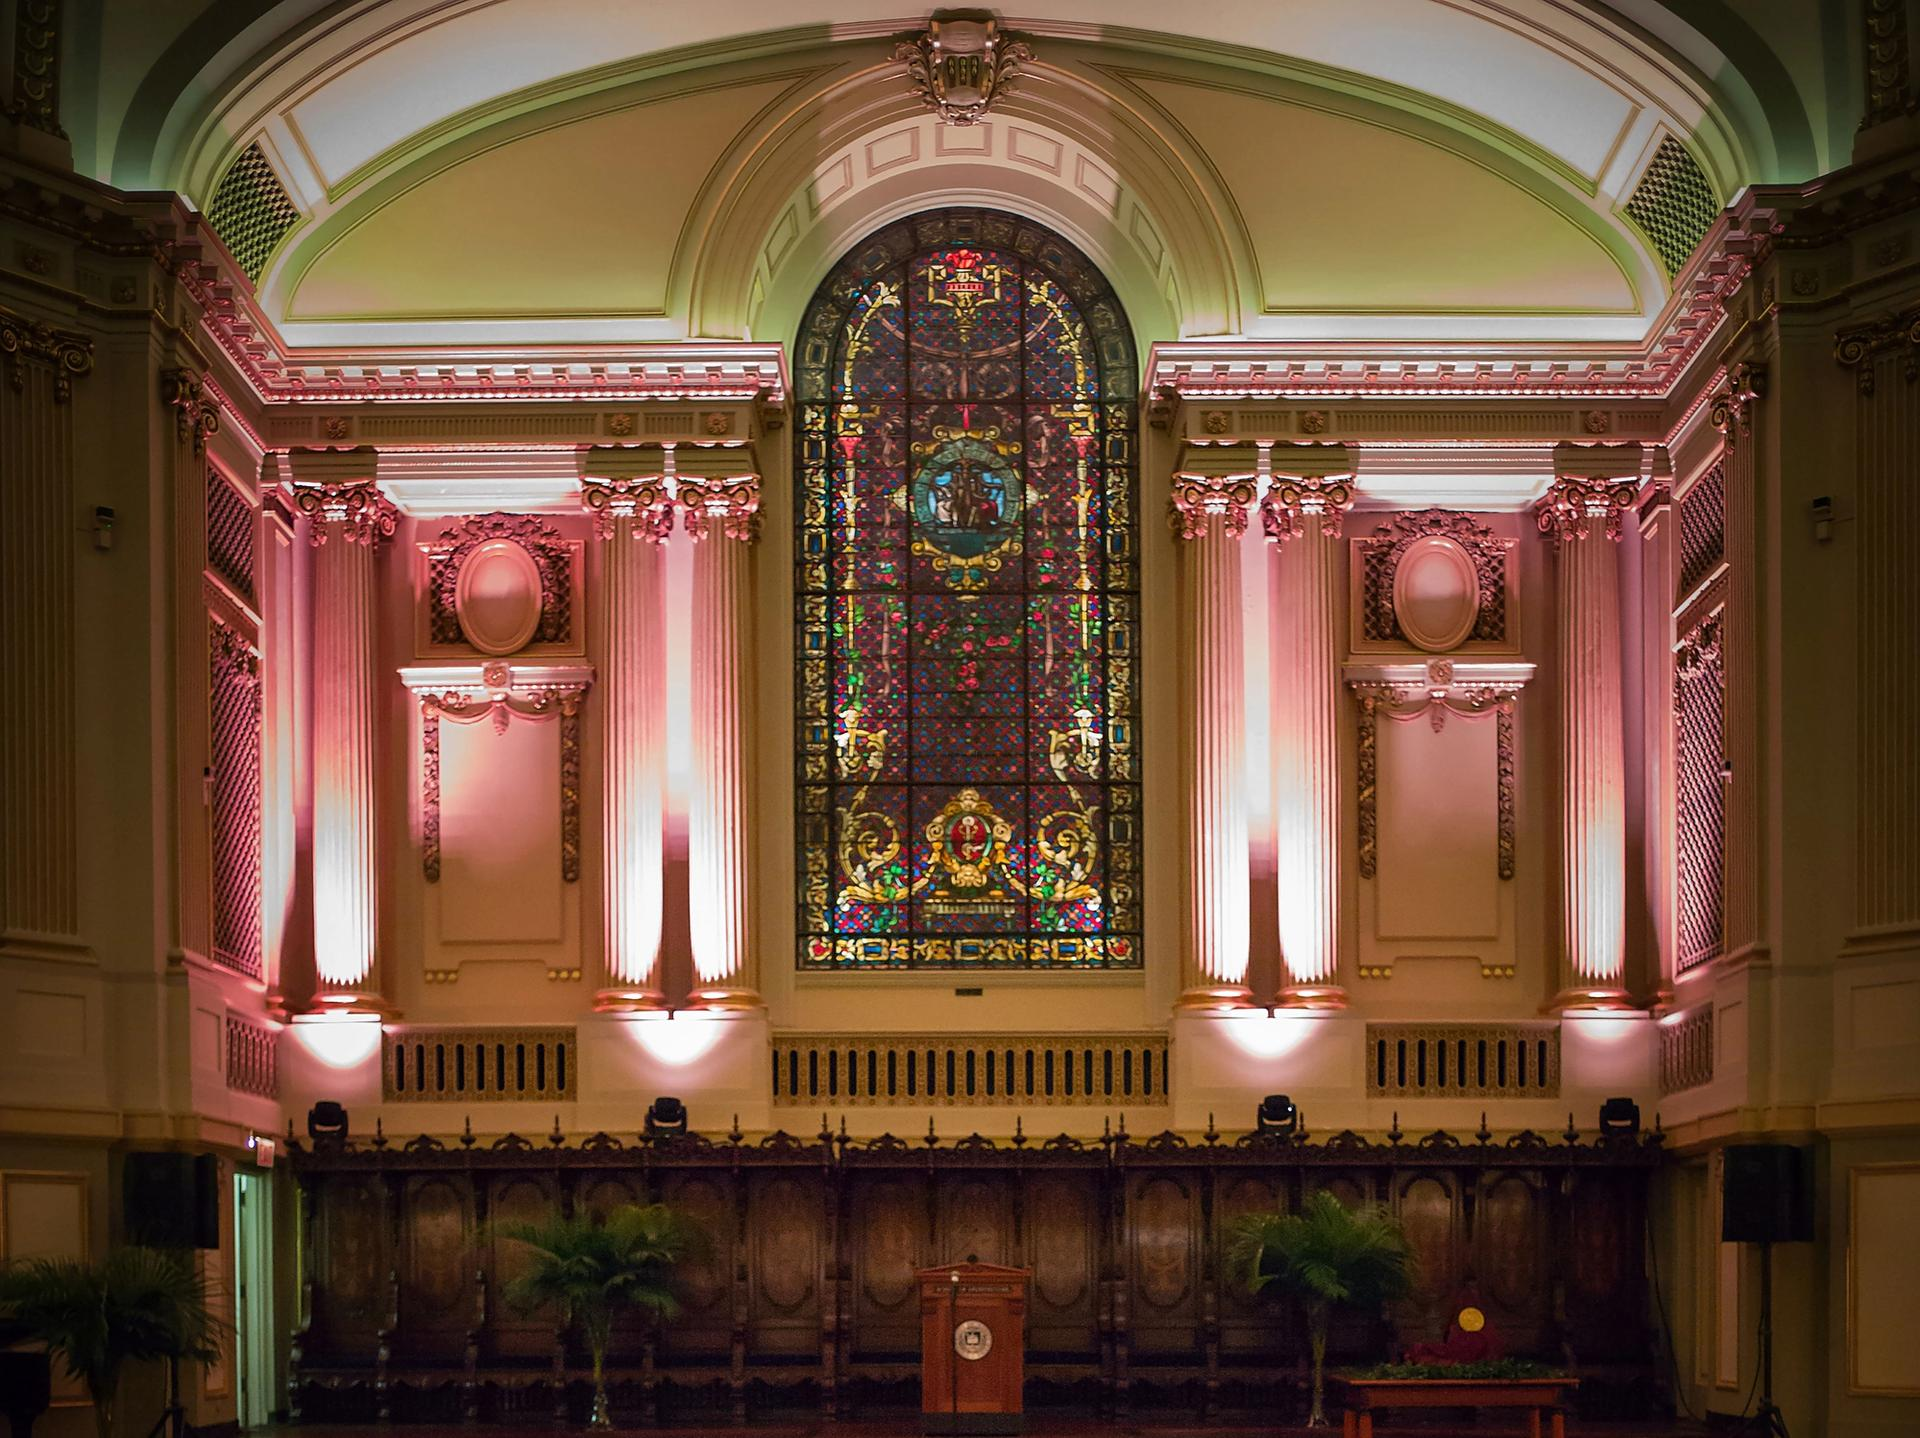 Inside the Murphy Auditorium Photo: Allen Bourgeois